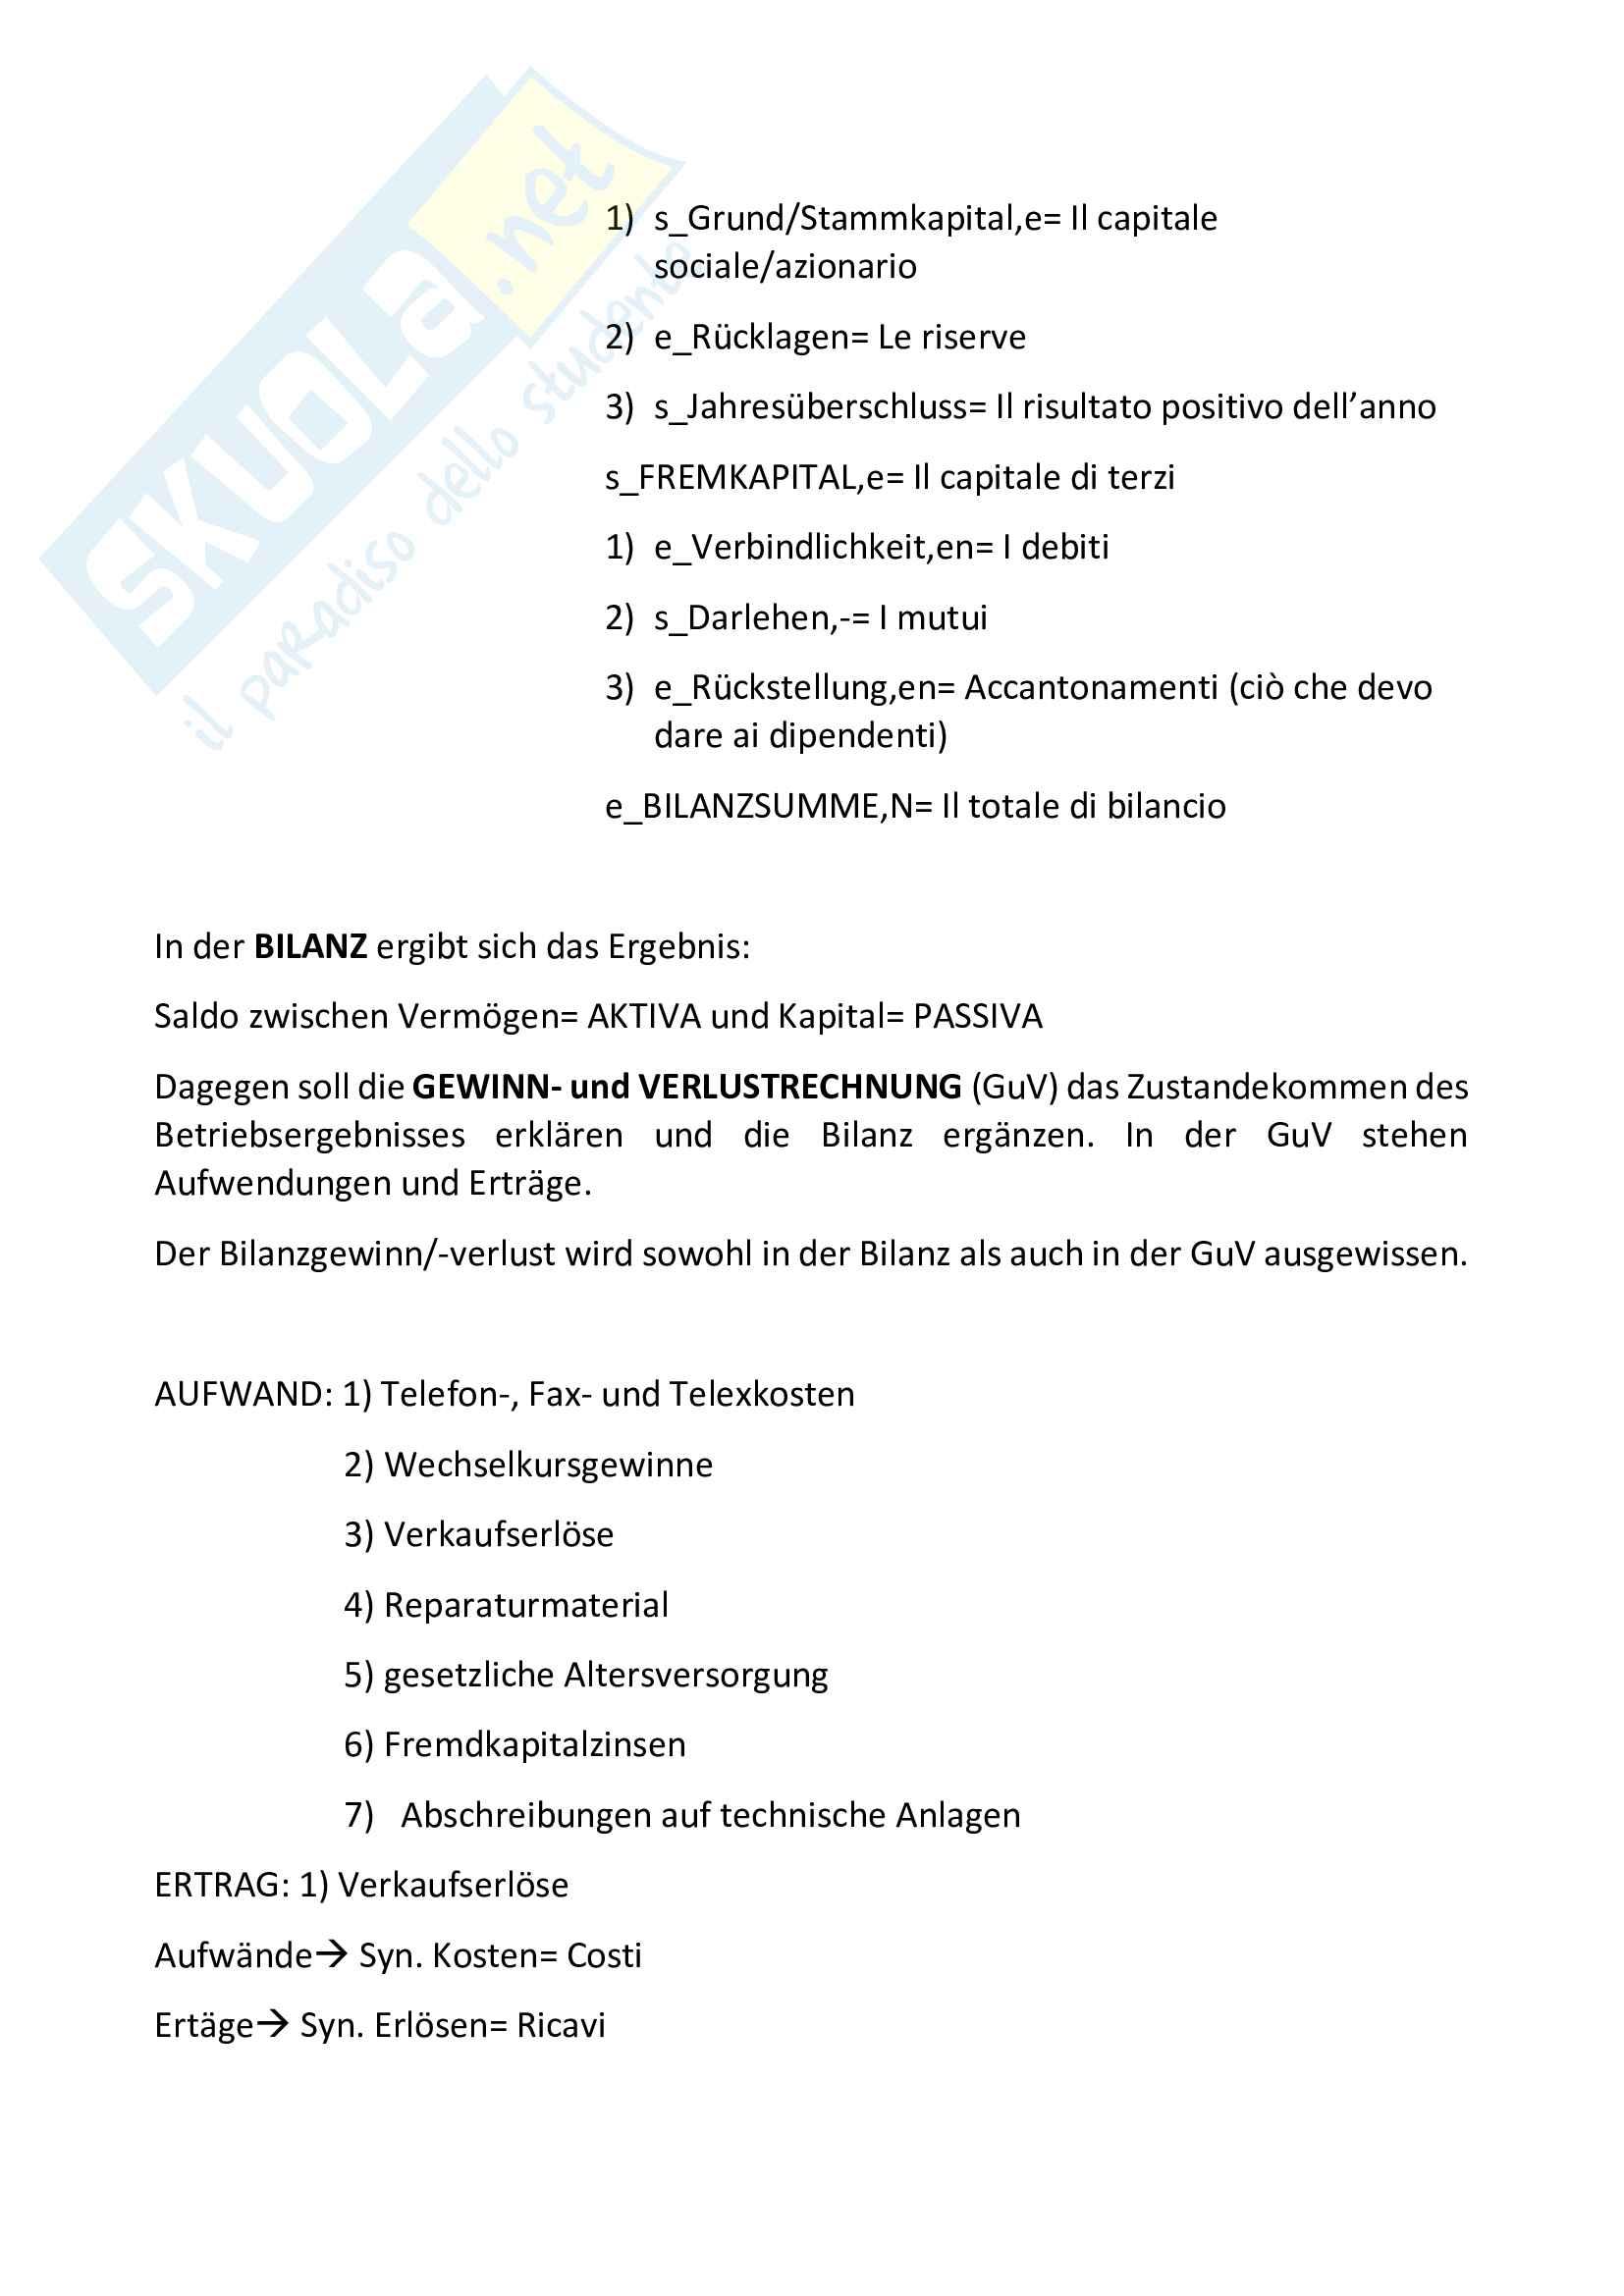 Appunti linguaggi settoriali tedesco Pag. 16